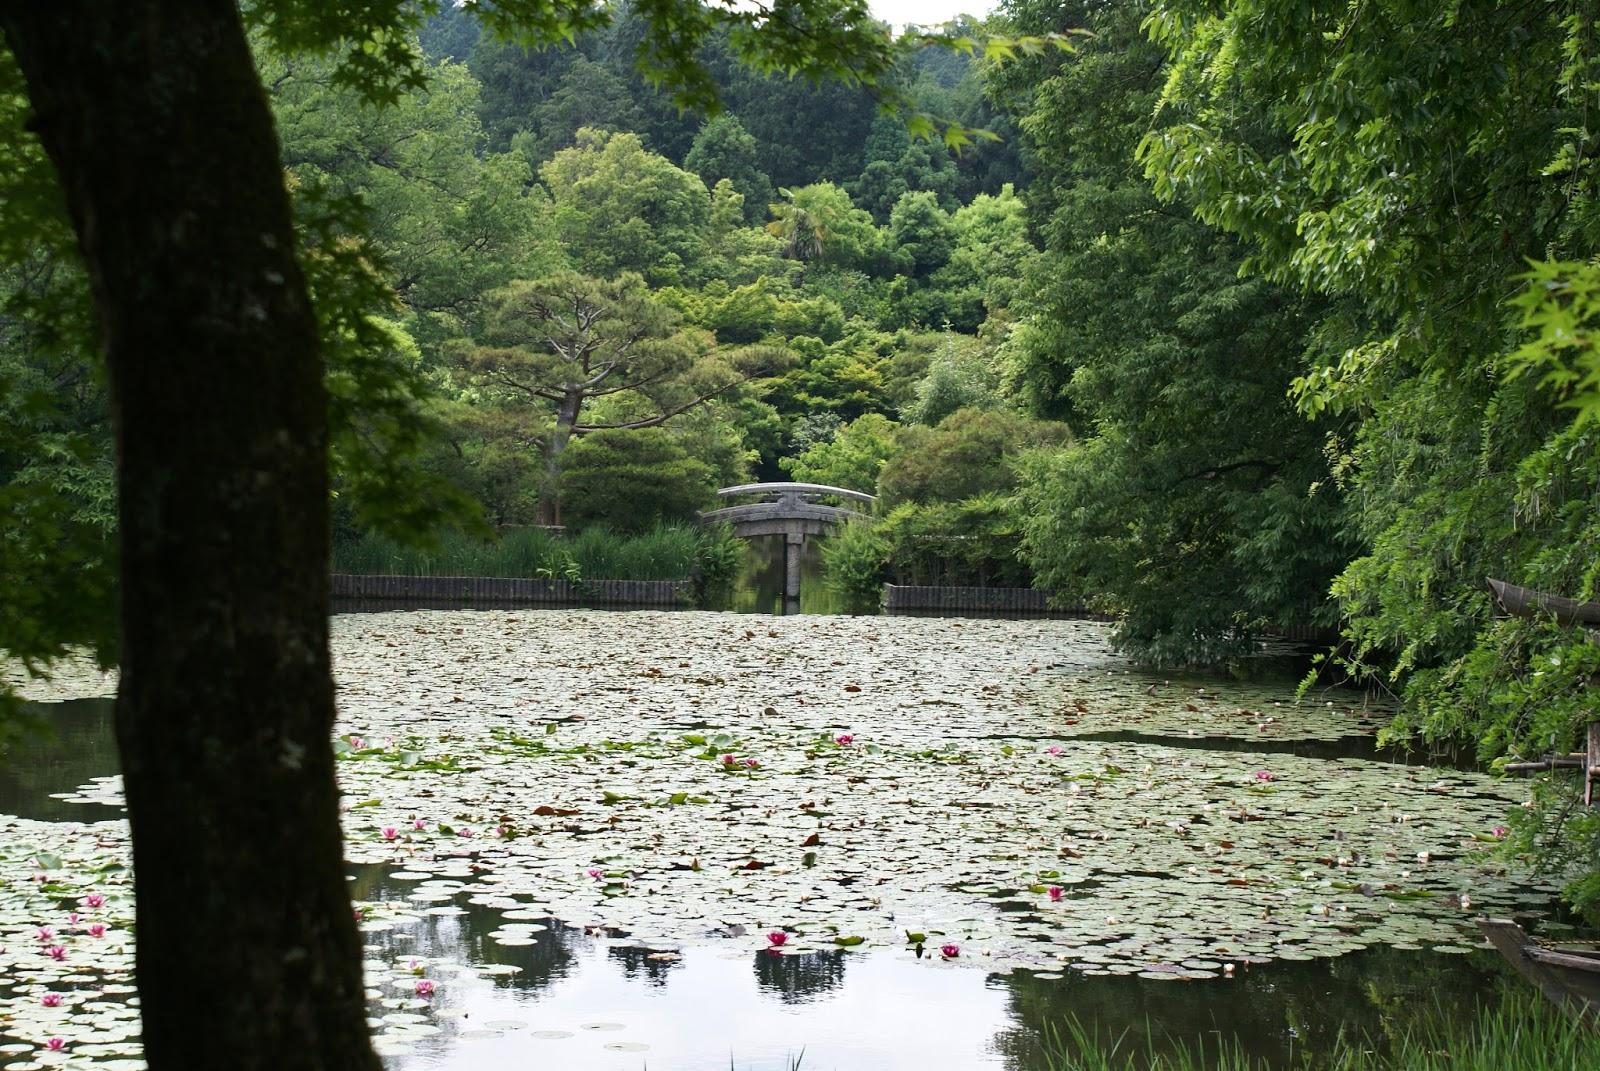 ryoan ji buddhist temple garden pond kyoto kansai japan asia